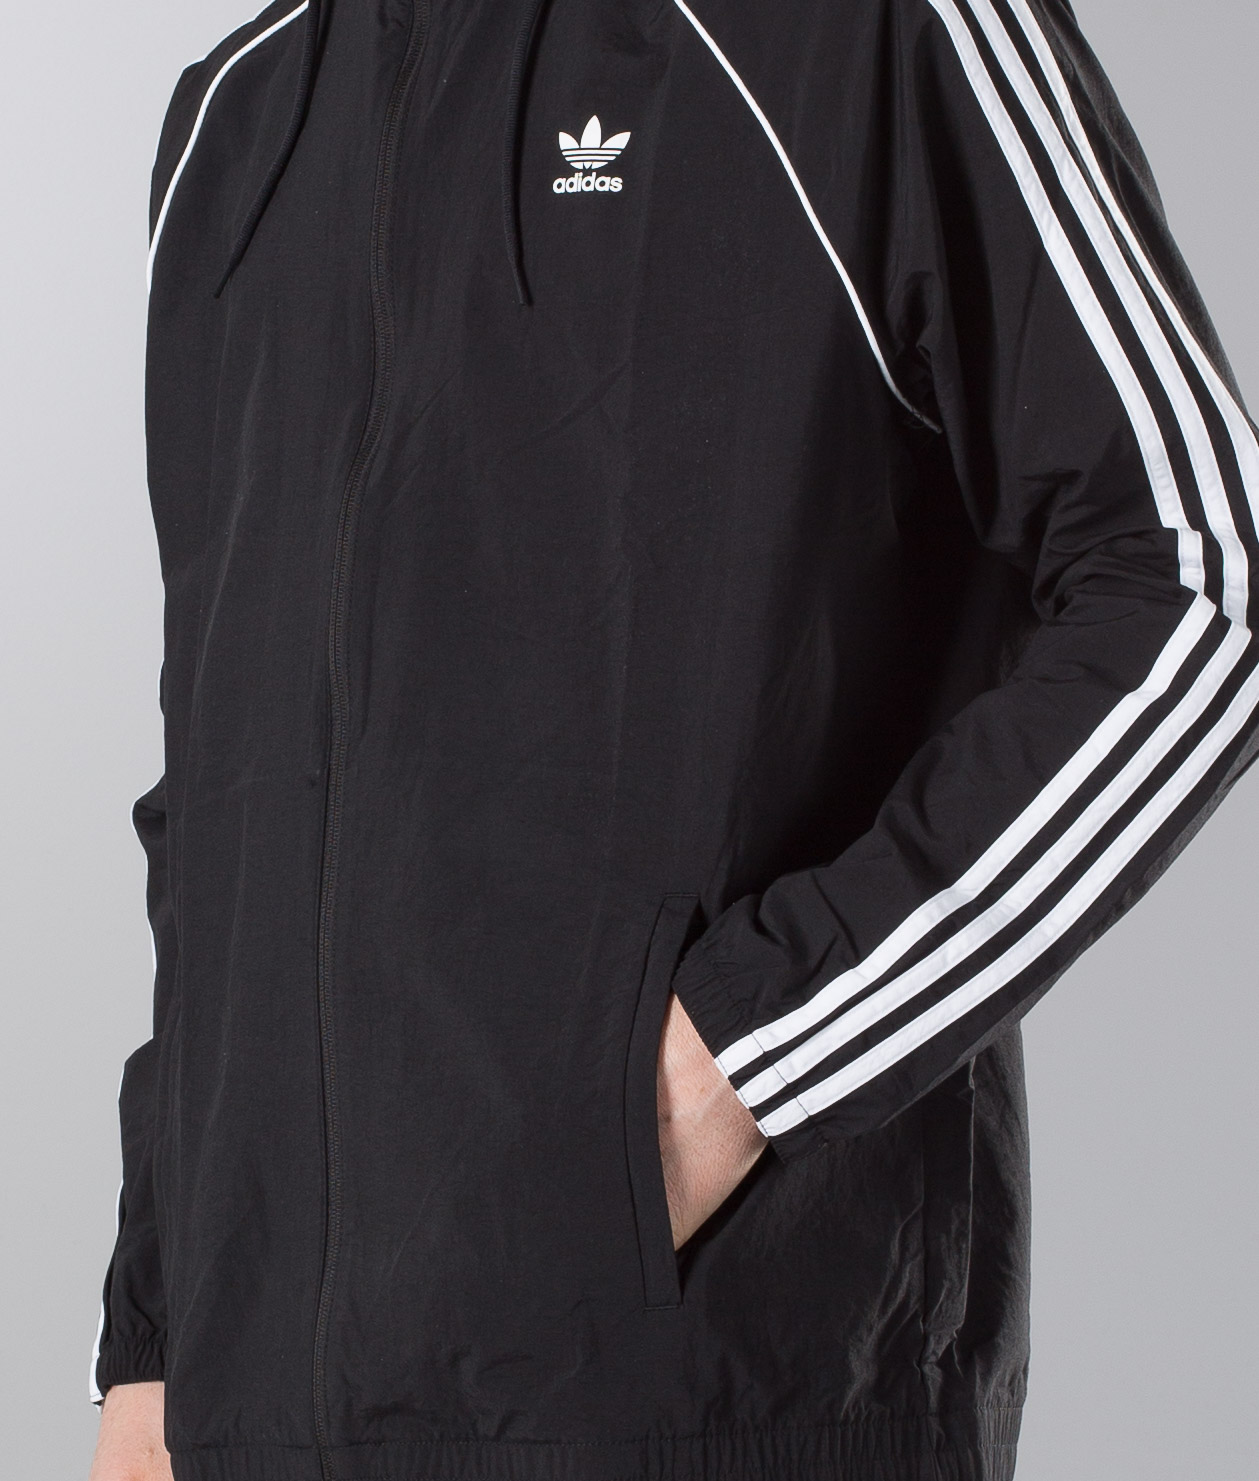 Adidas Originals SST Jacke Black